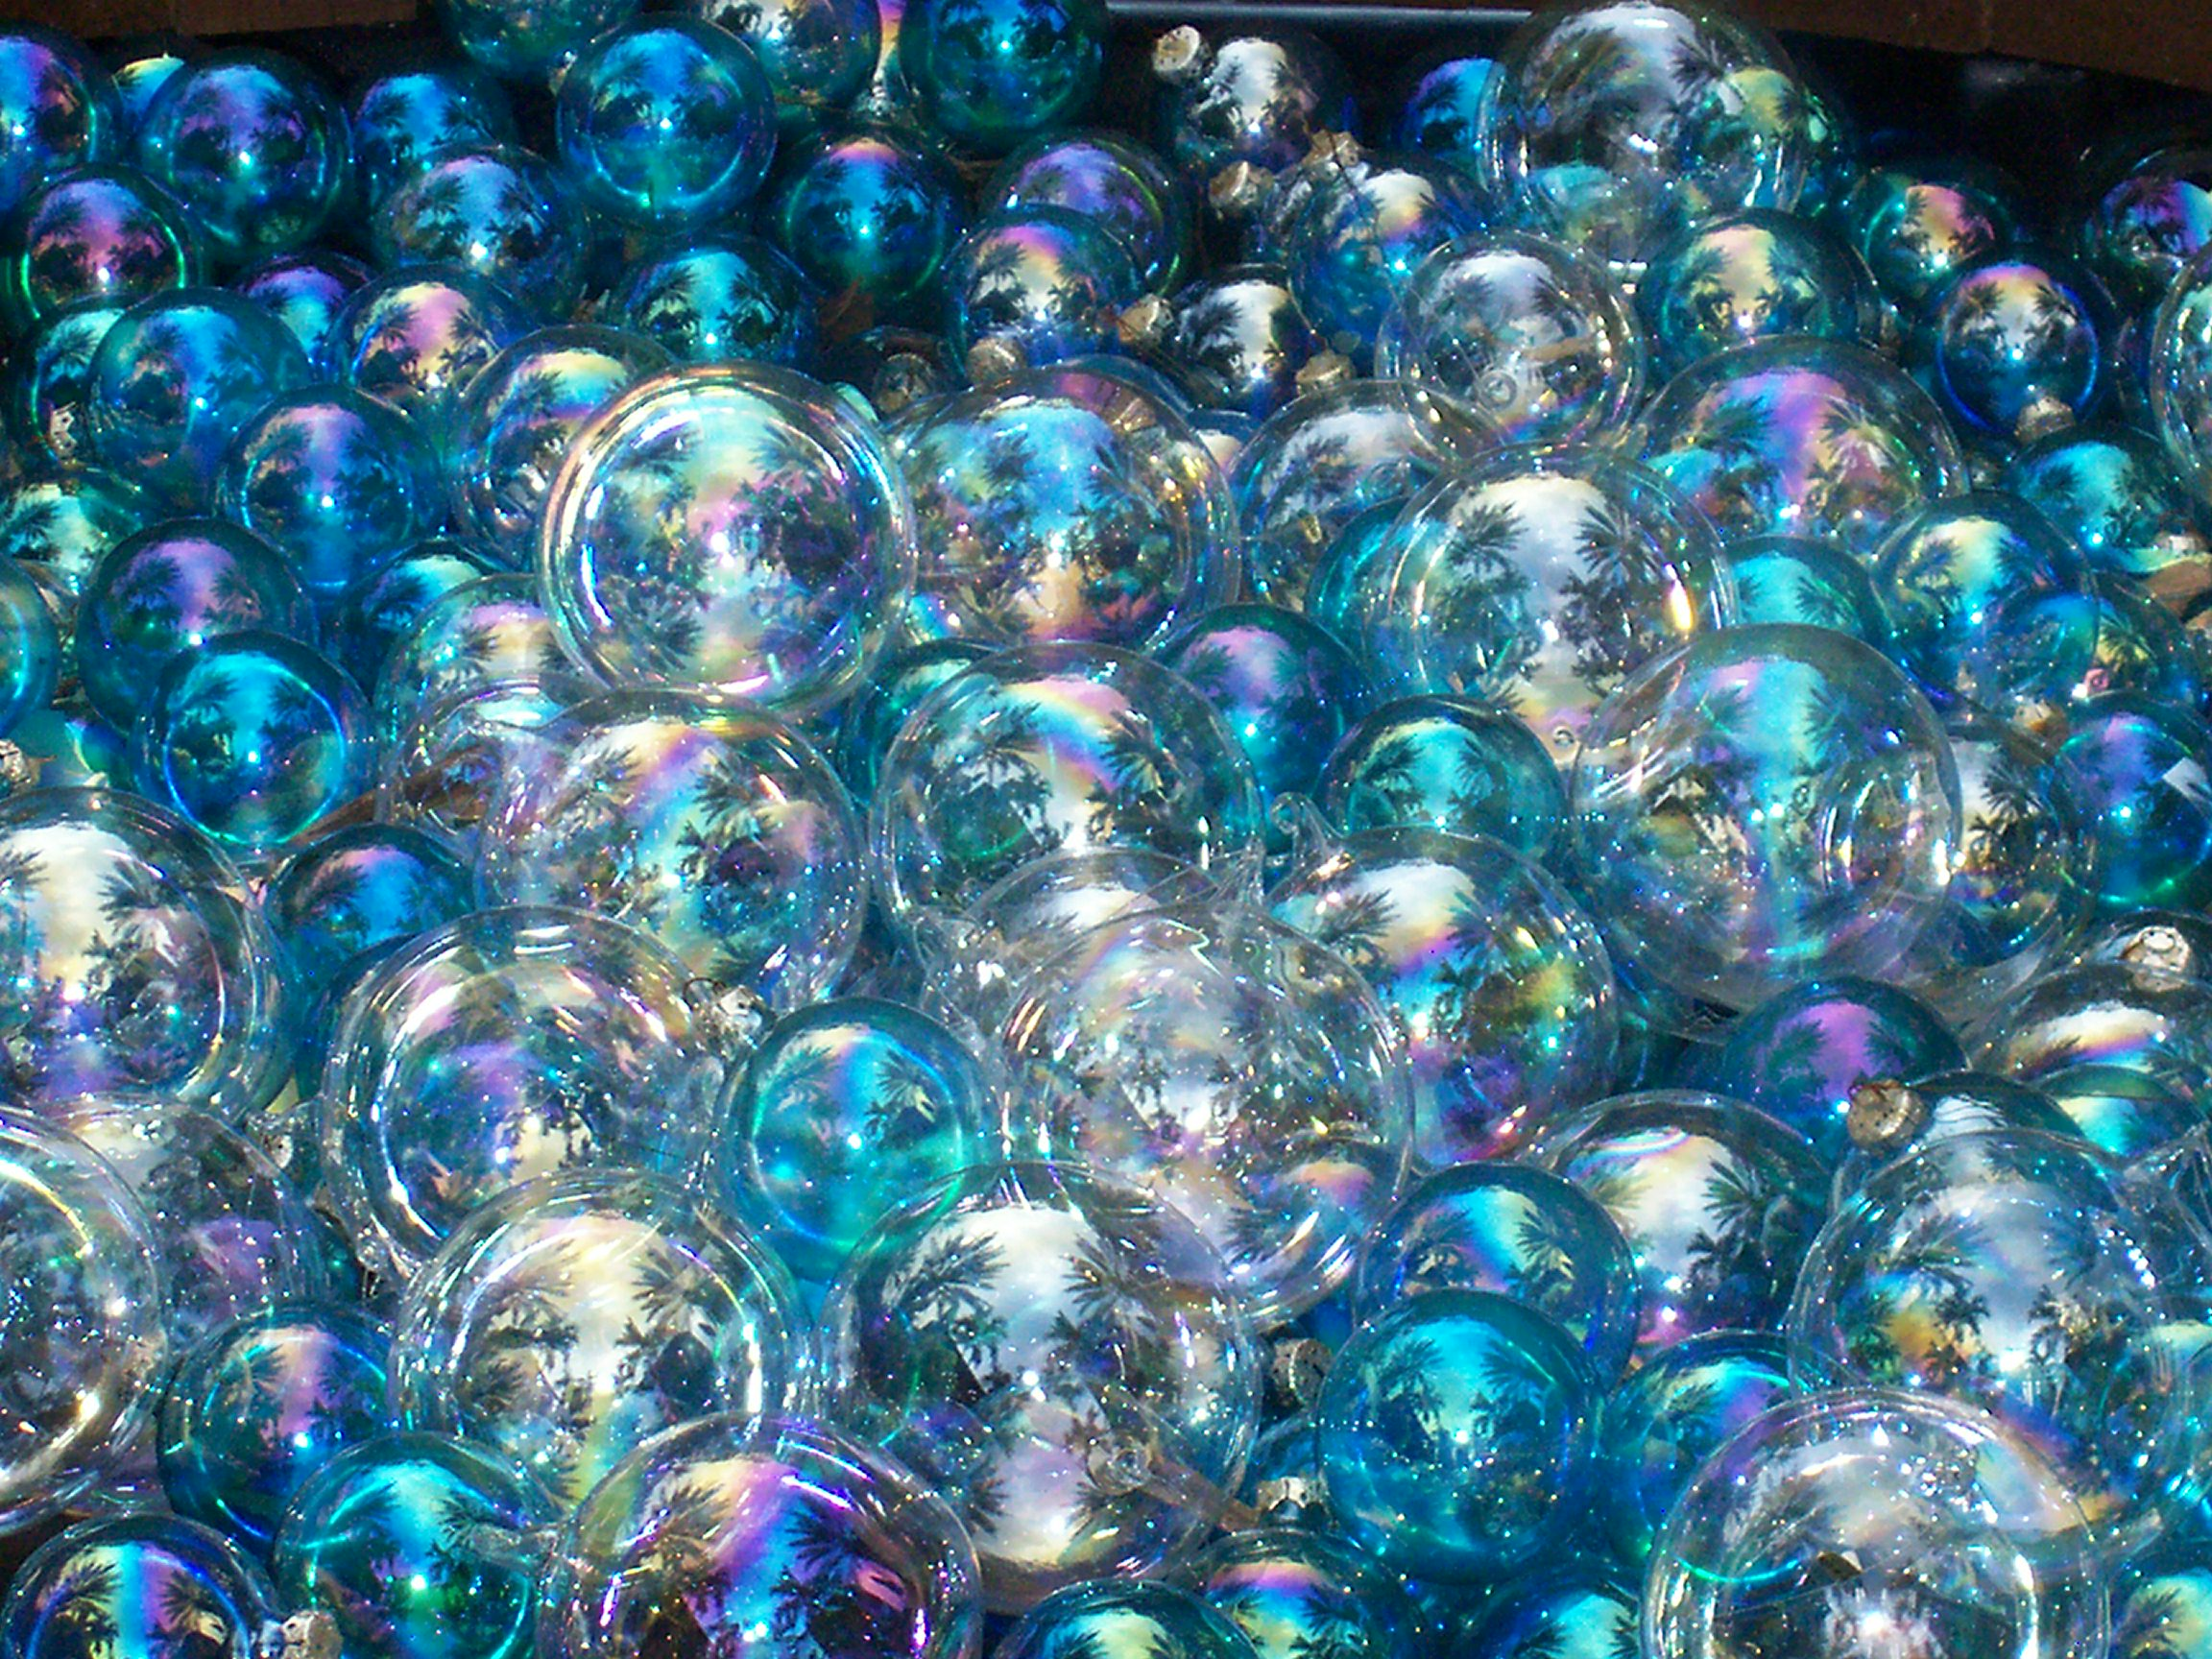 Bubbles images Bubbles HD wallpaper and background photos (40143287)